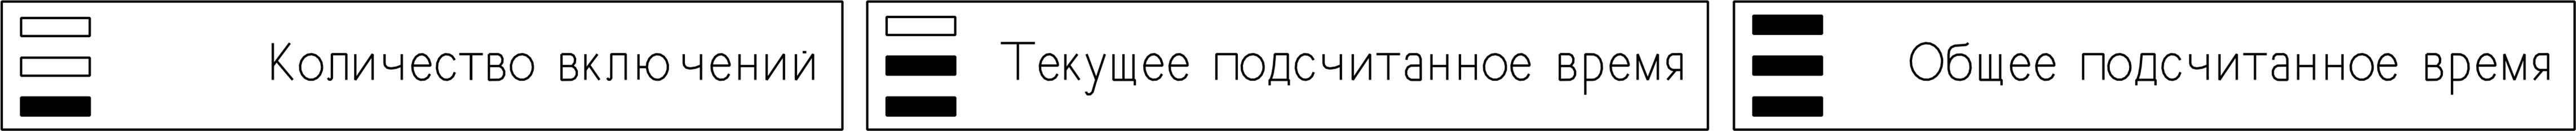 Индикация СИМ-05Ч-13